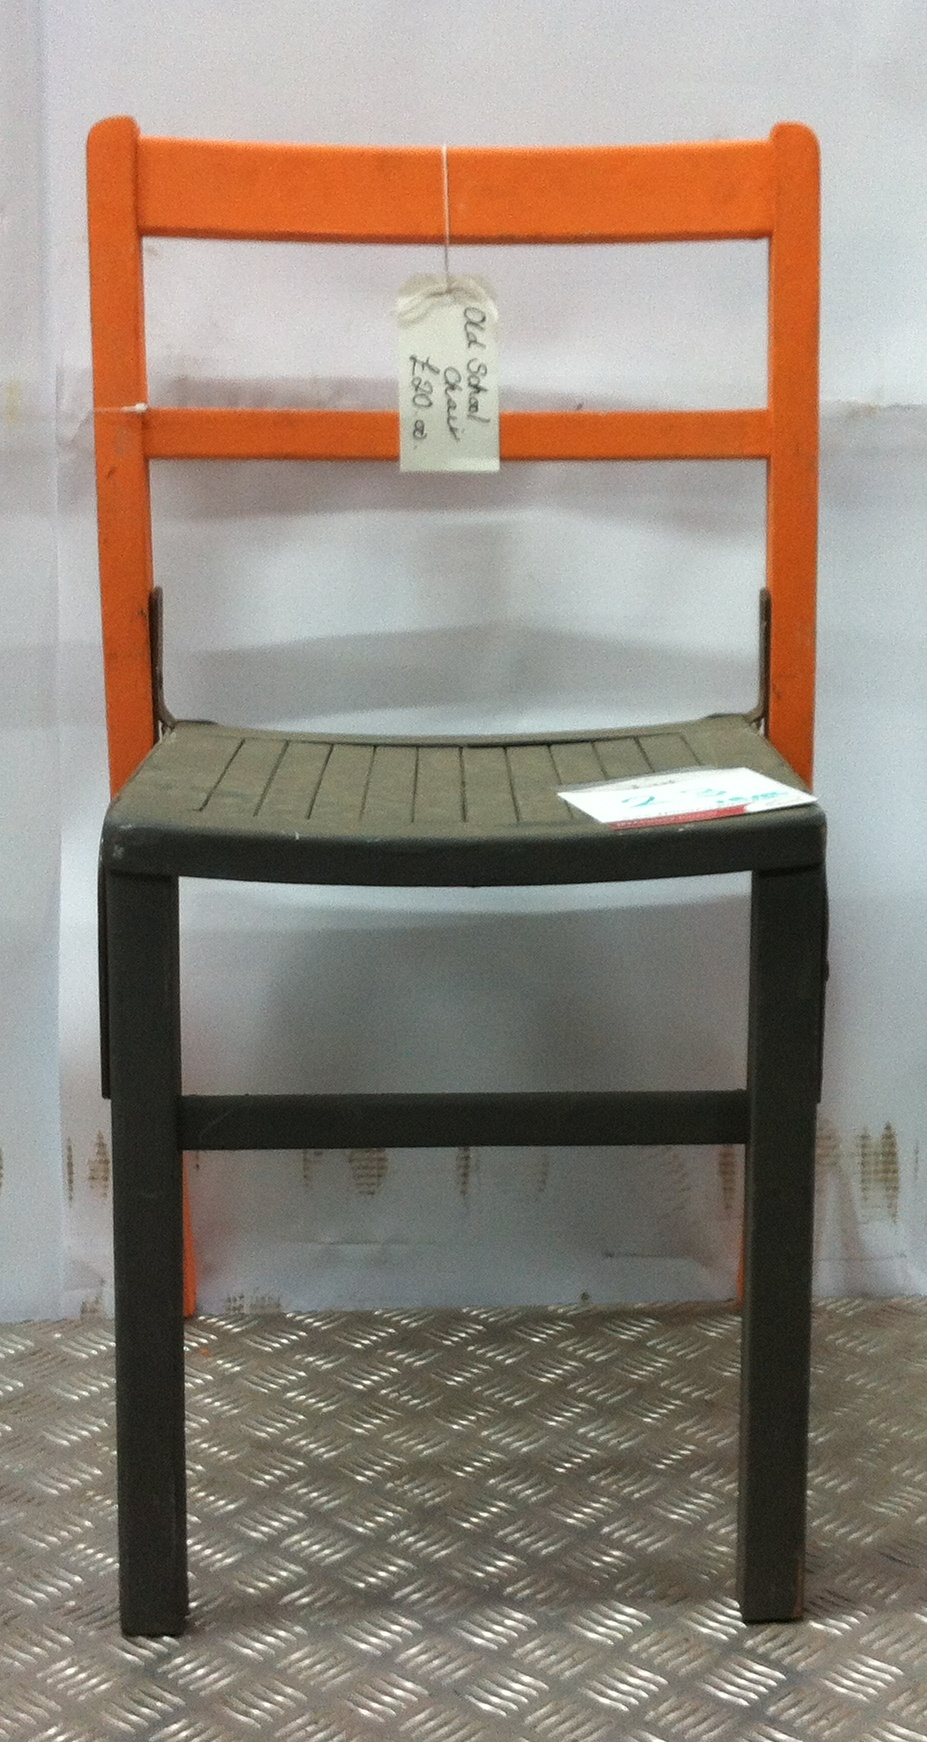 Lot 23 - Retro Old School Chair